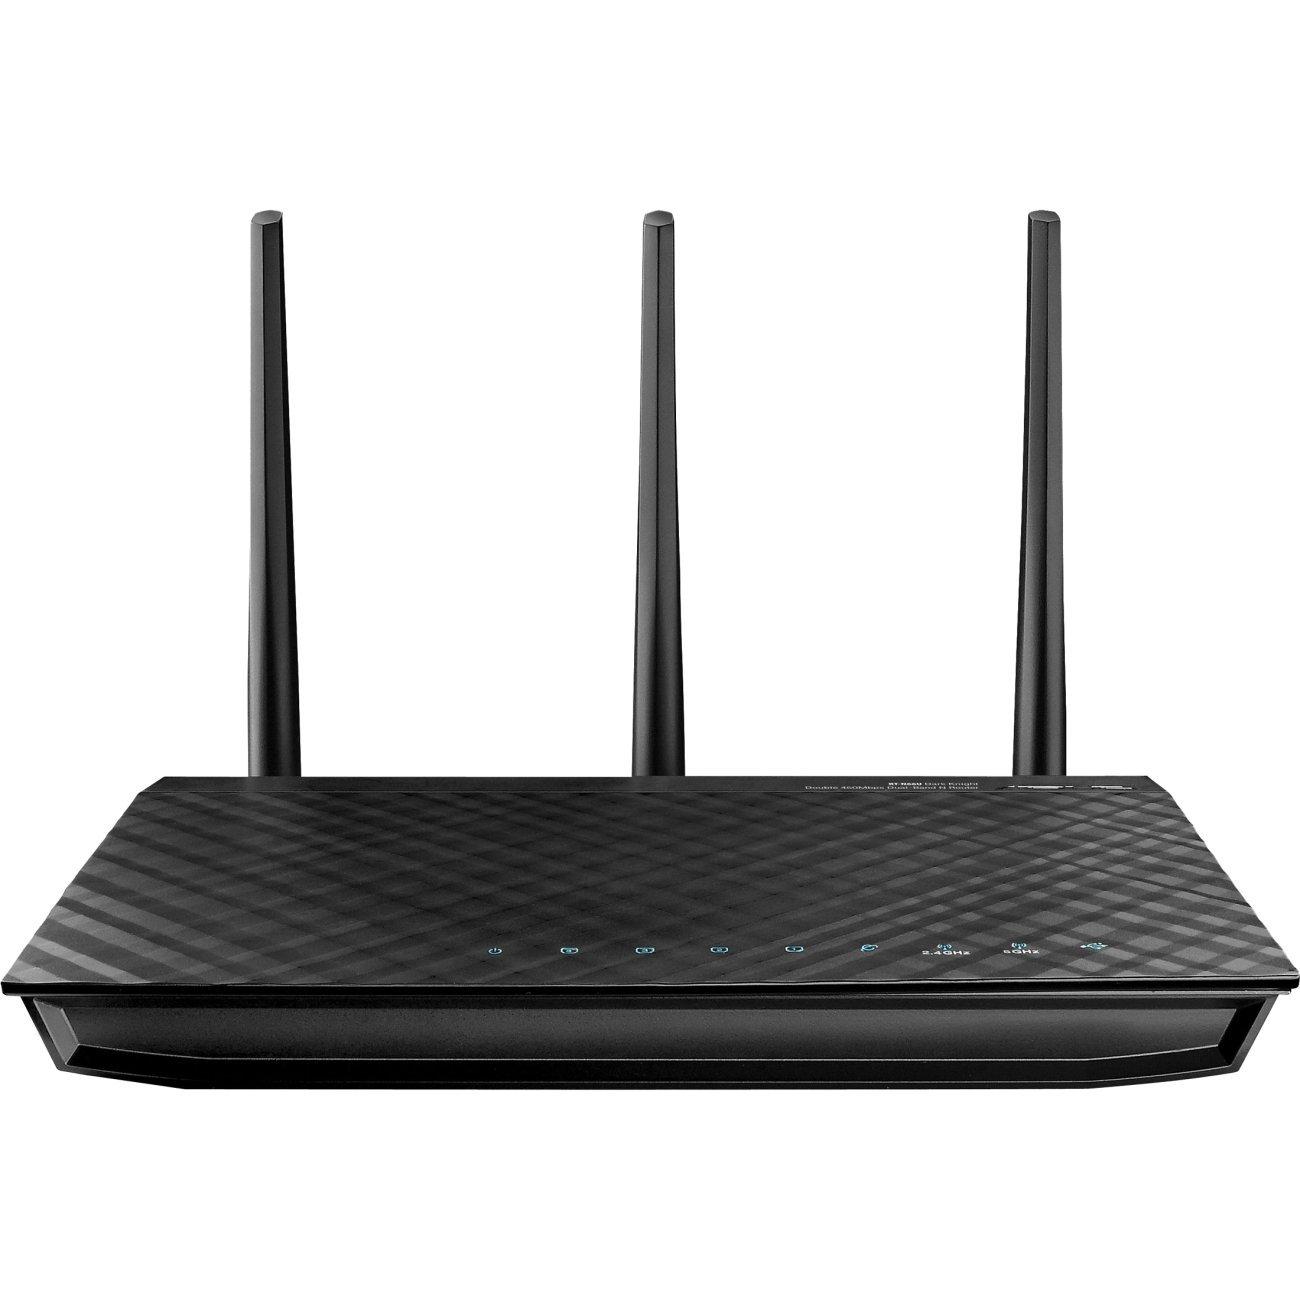 Medium End Internet Router (ASUS RT-N66U)